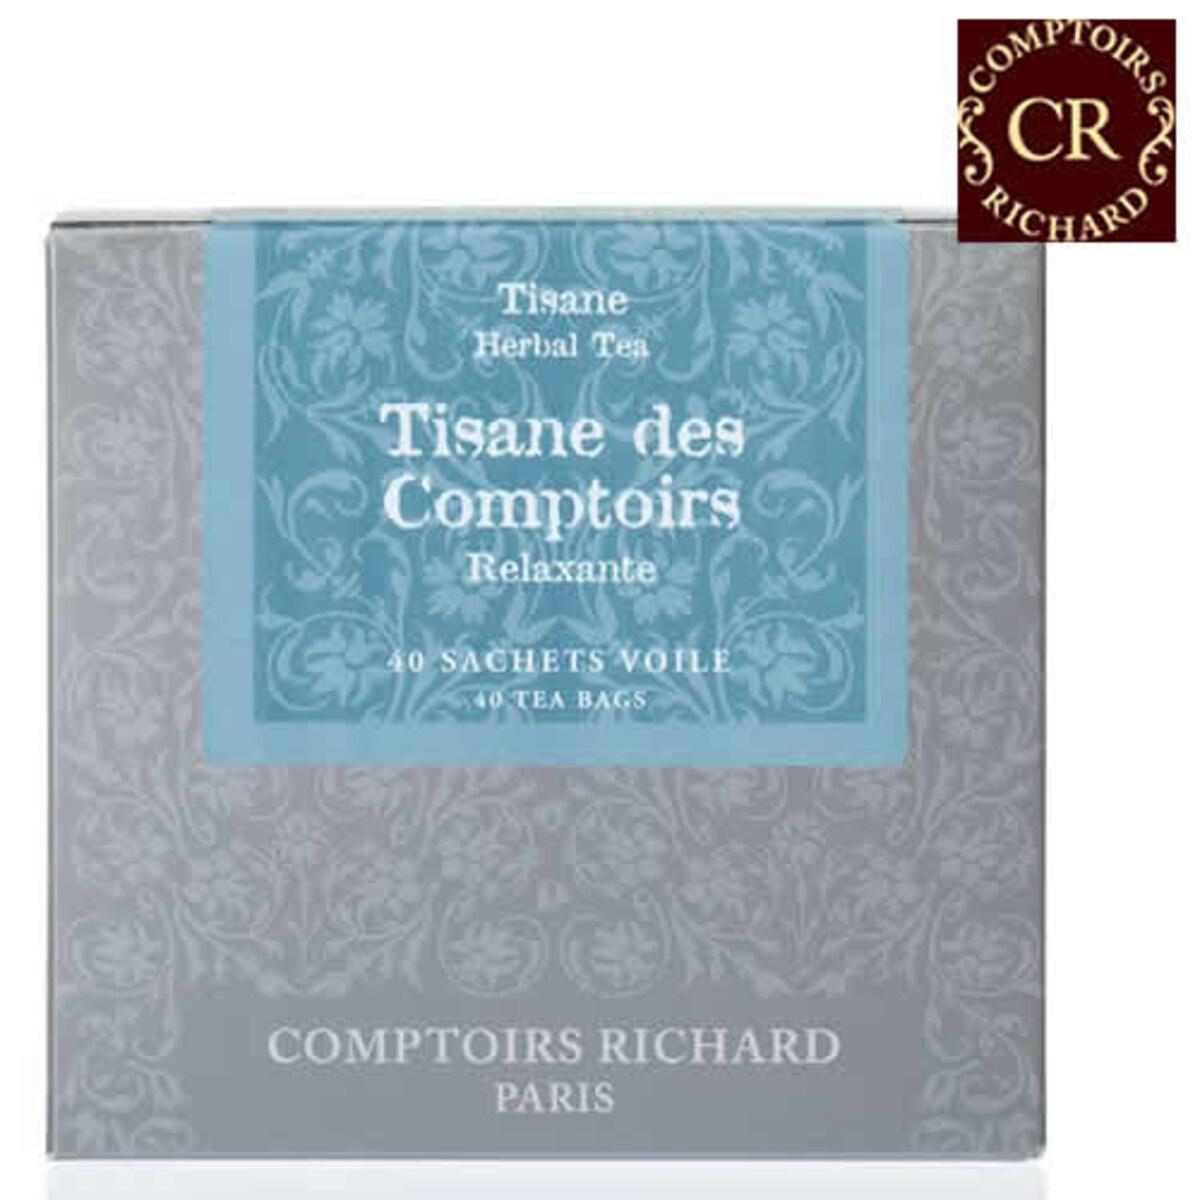 Comptoirs Richard - 40бр сашета билков чай Бутик Ришар